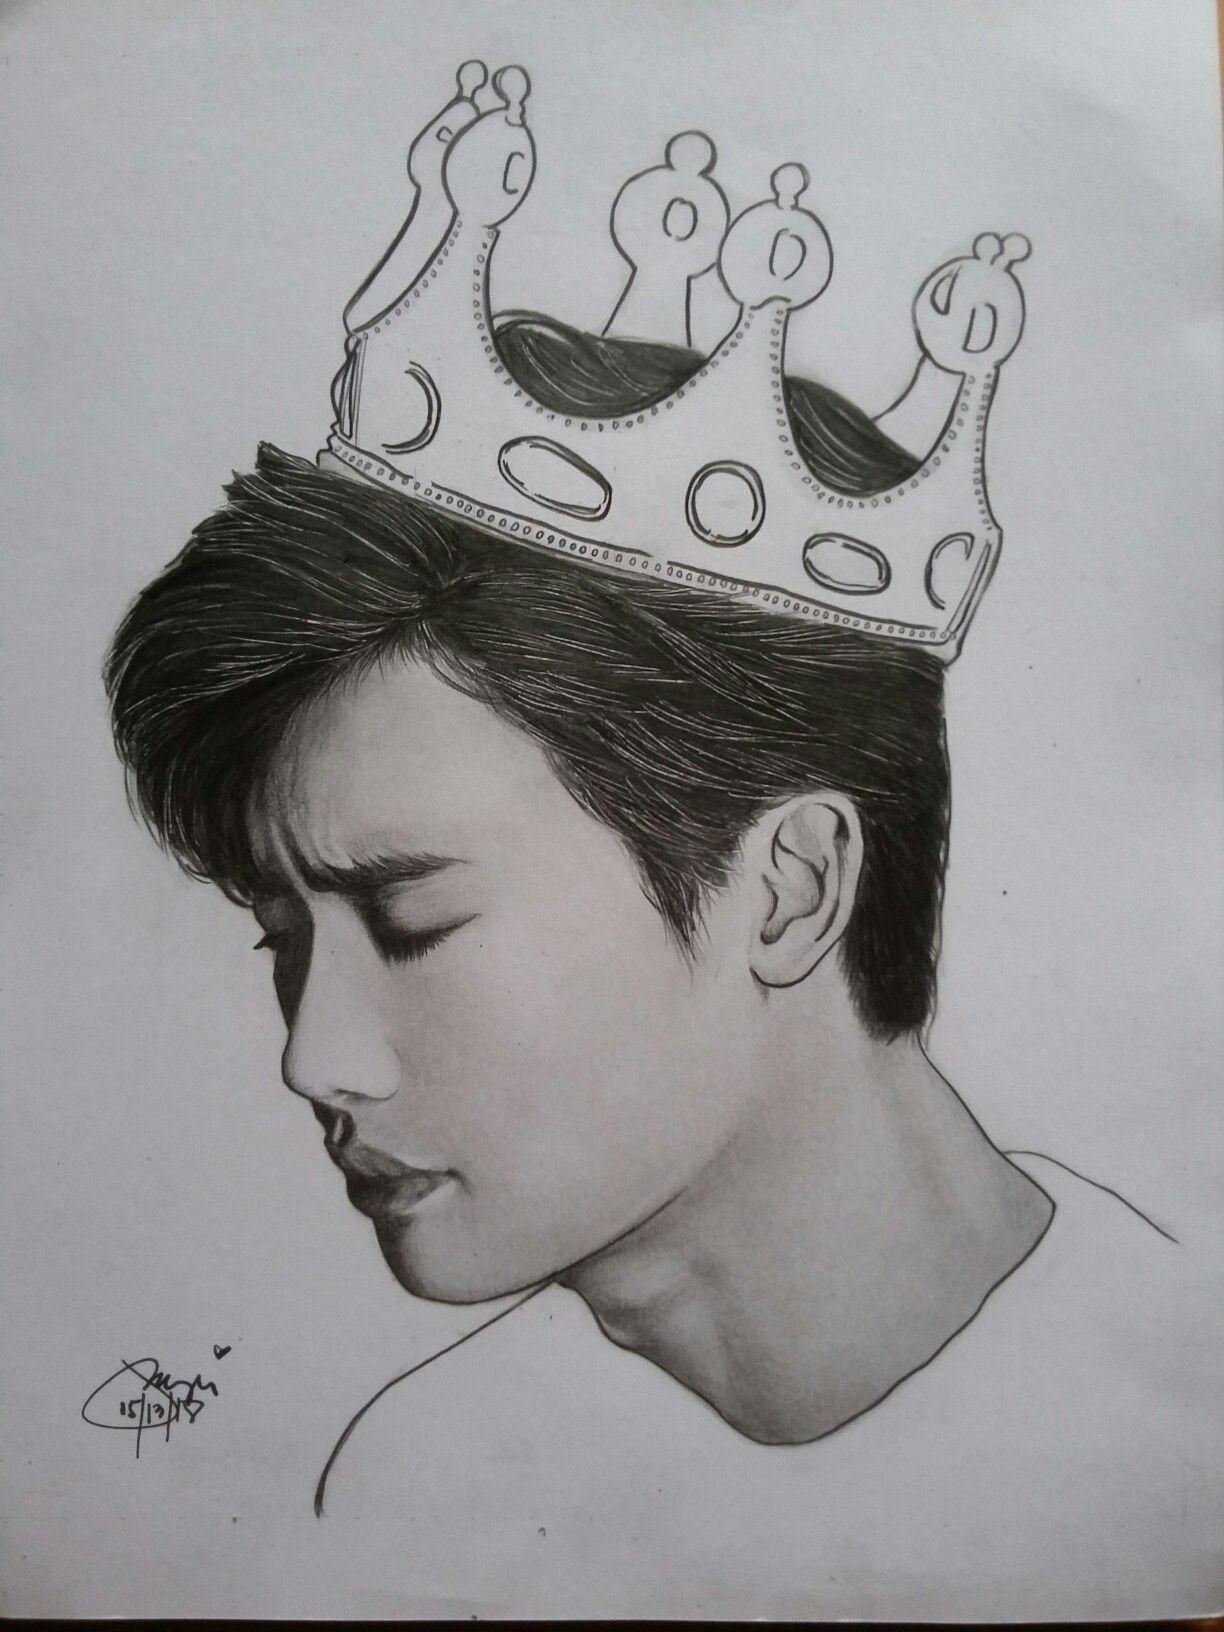 Lee Jong Suk Drawings Art Male Sketch